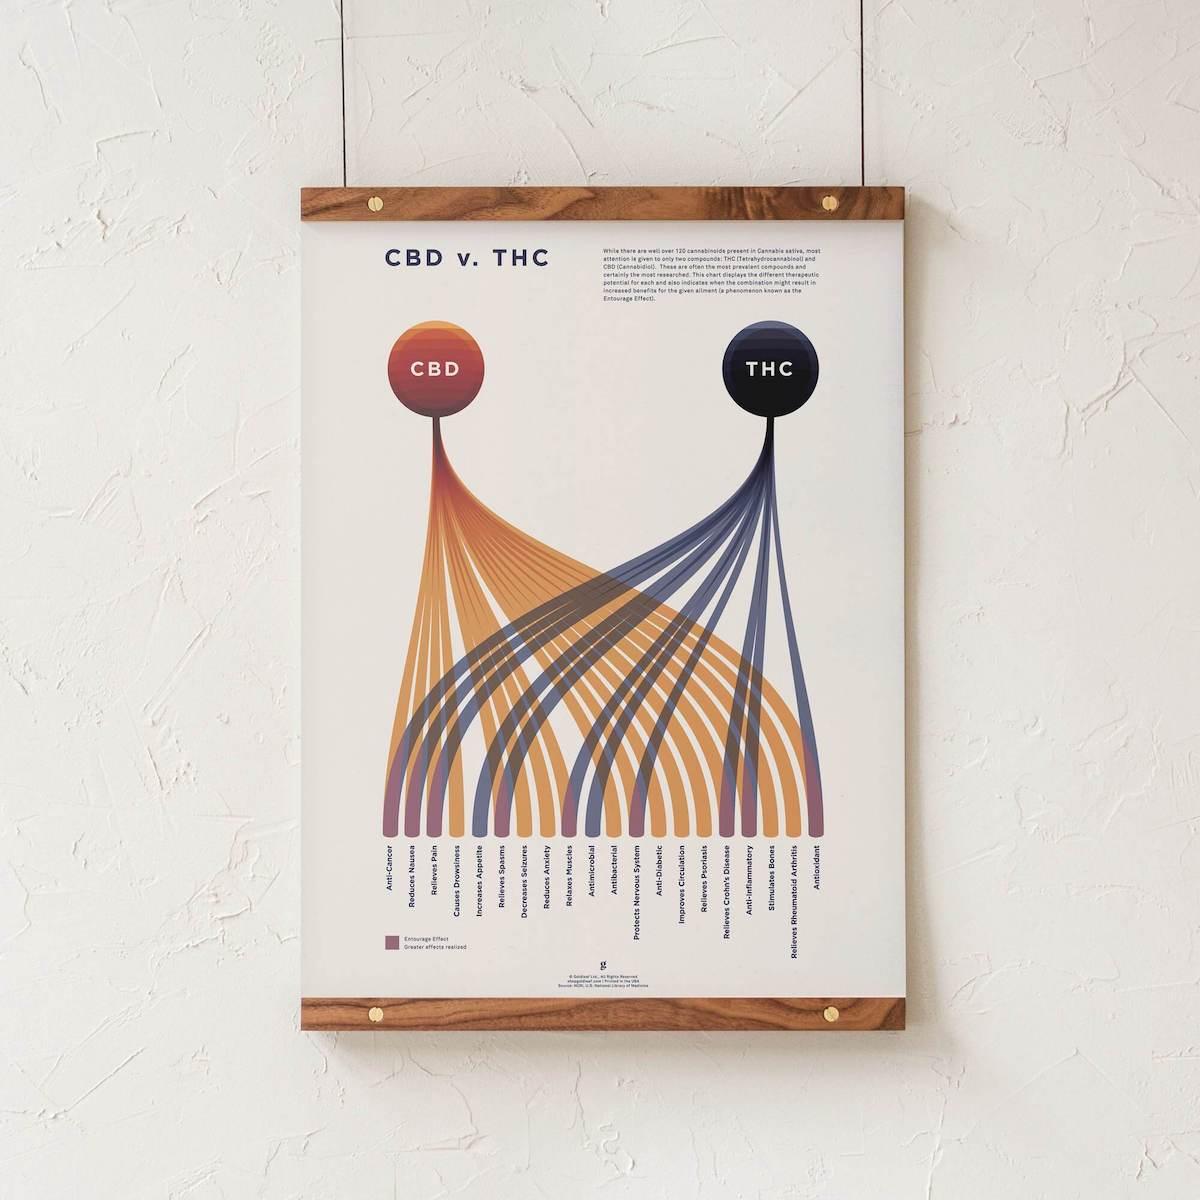 cbd vs thc chart